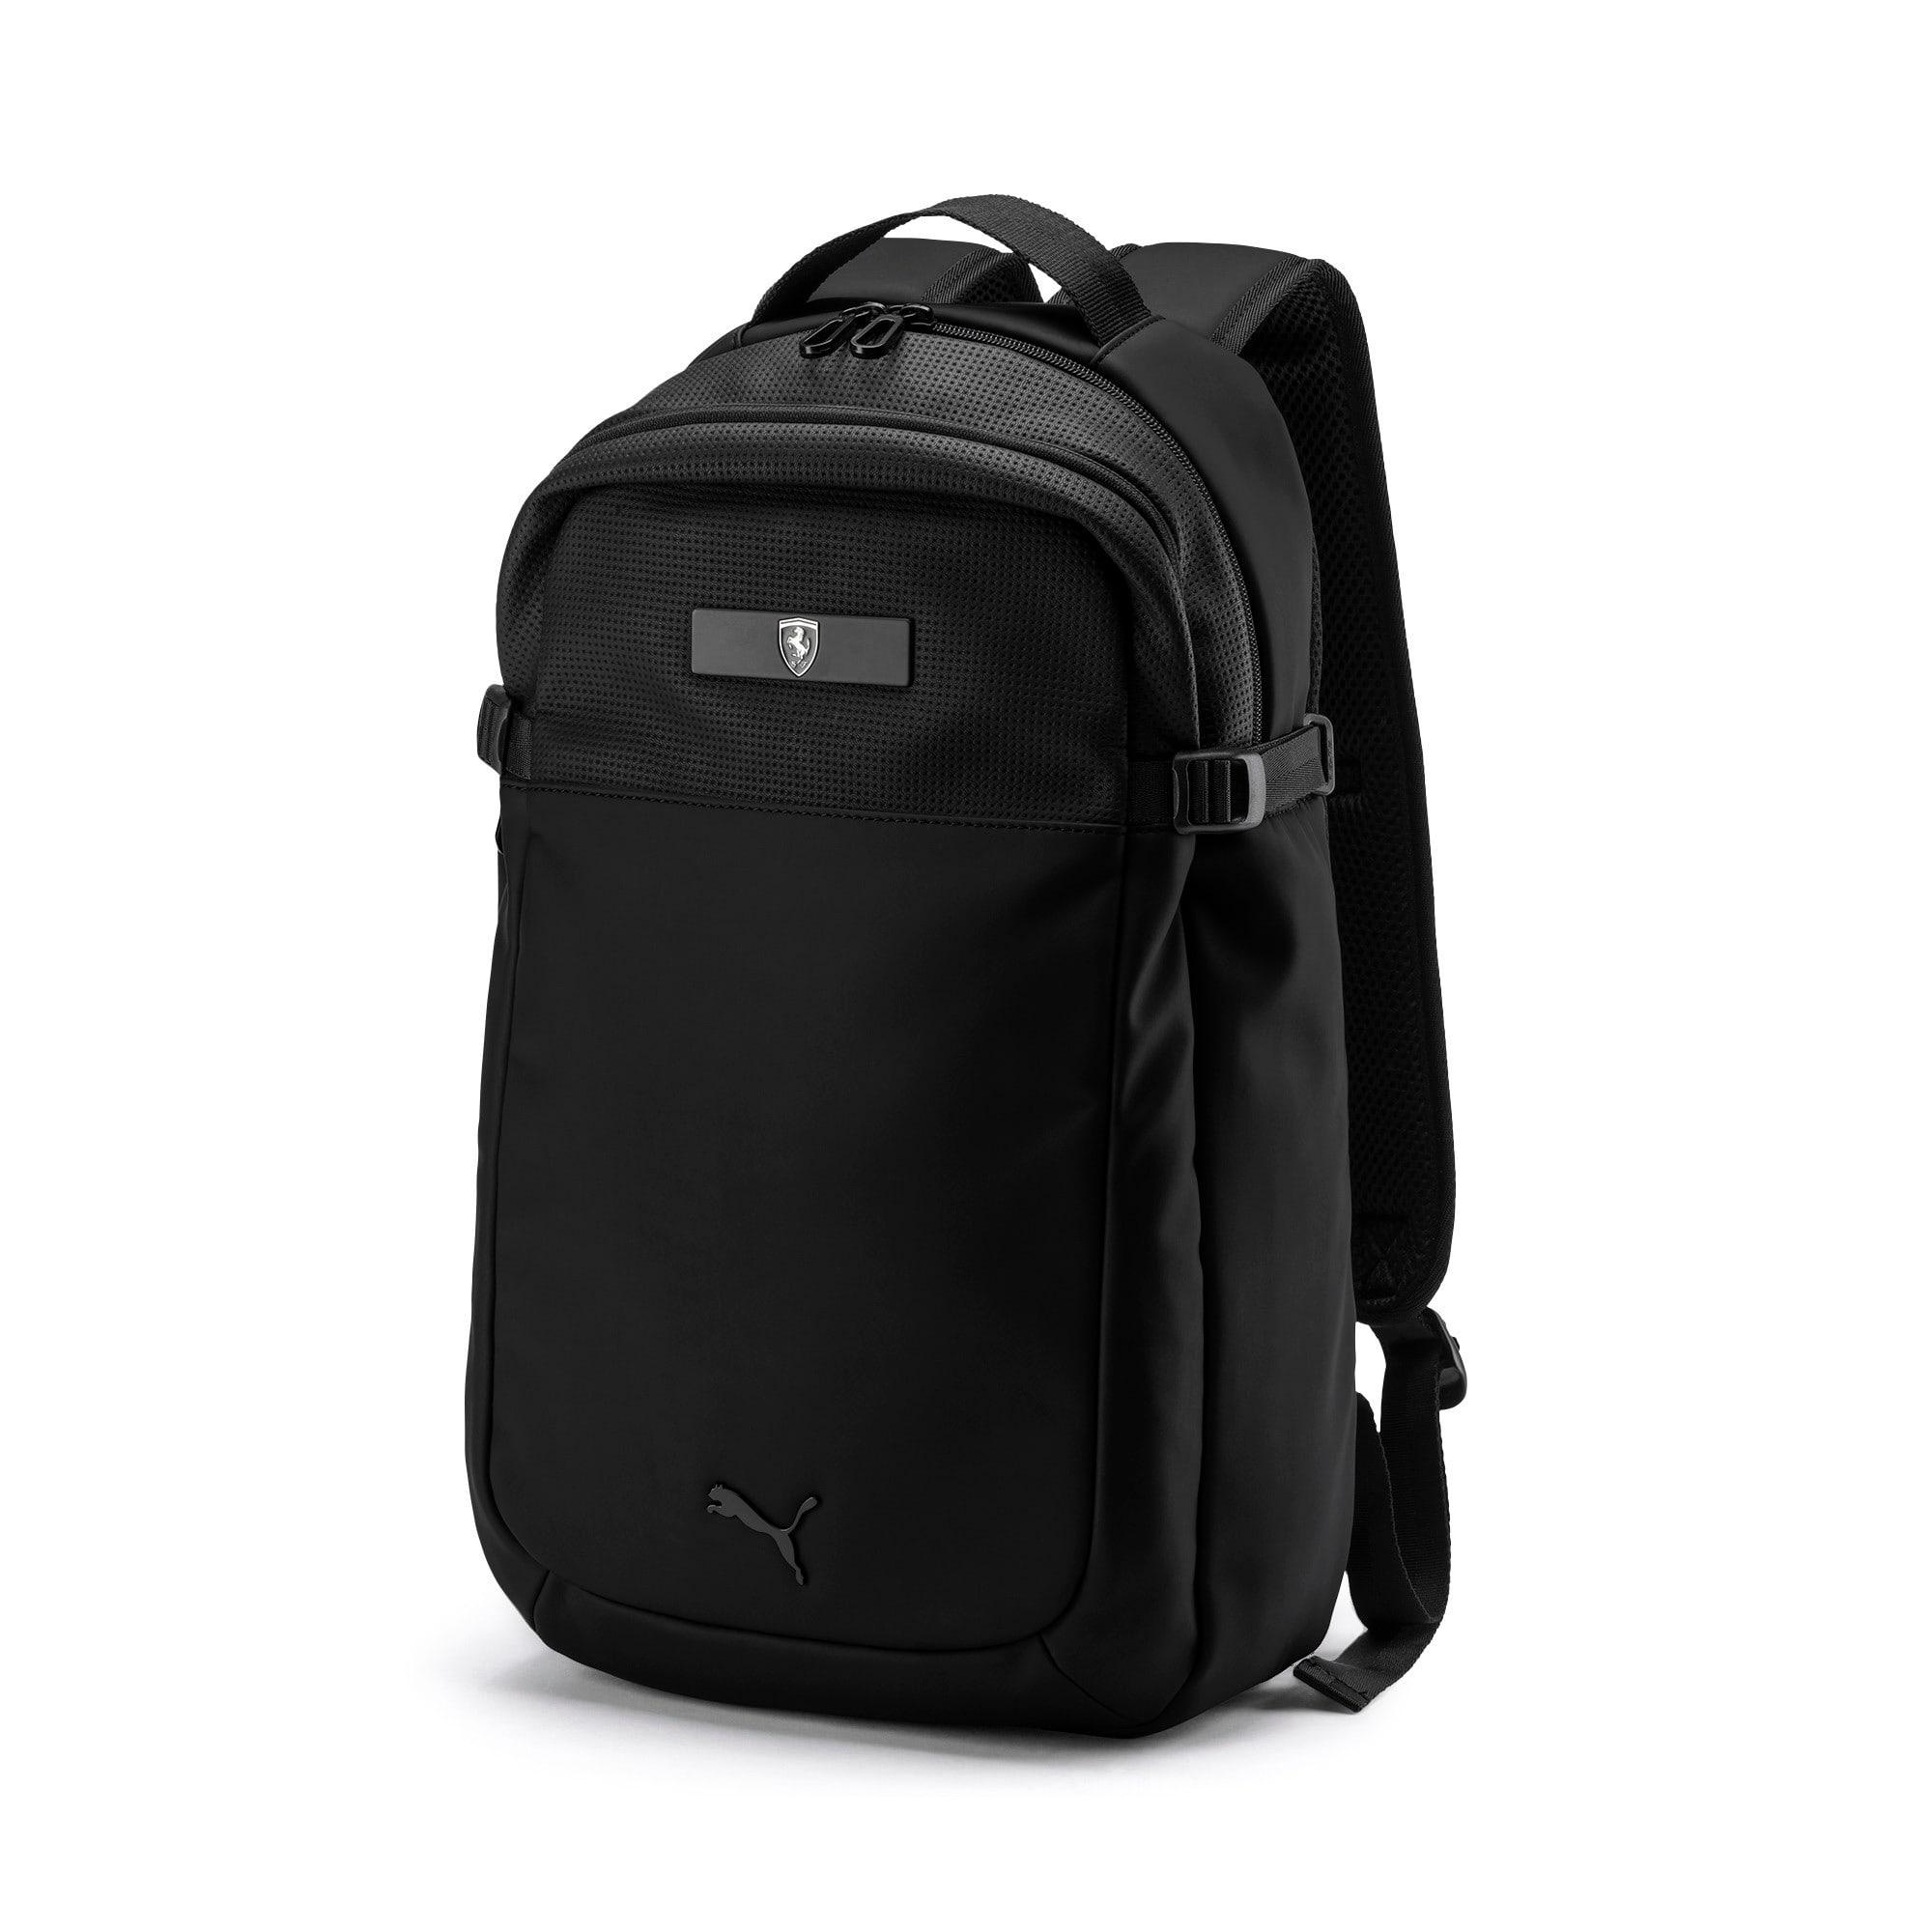 Thumbnail 1 of Ferrari Lifestyle Backpack, Puma Black, medium